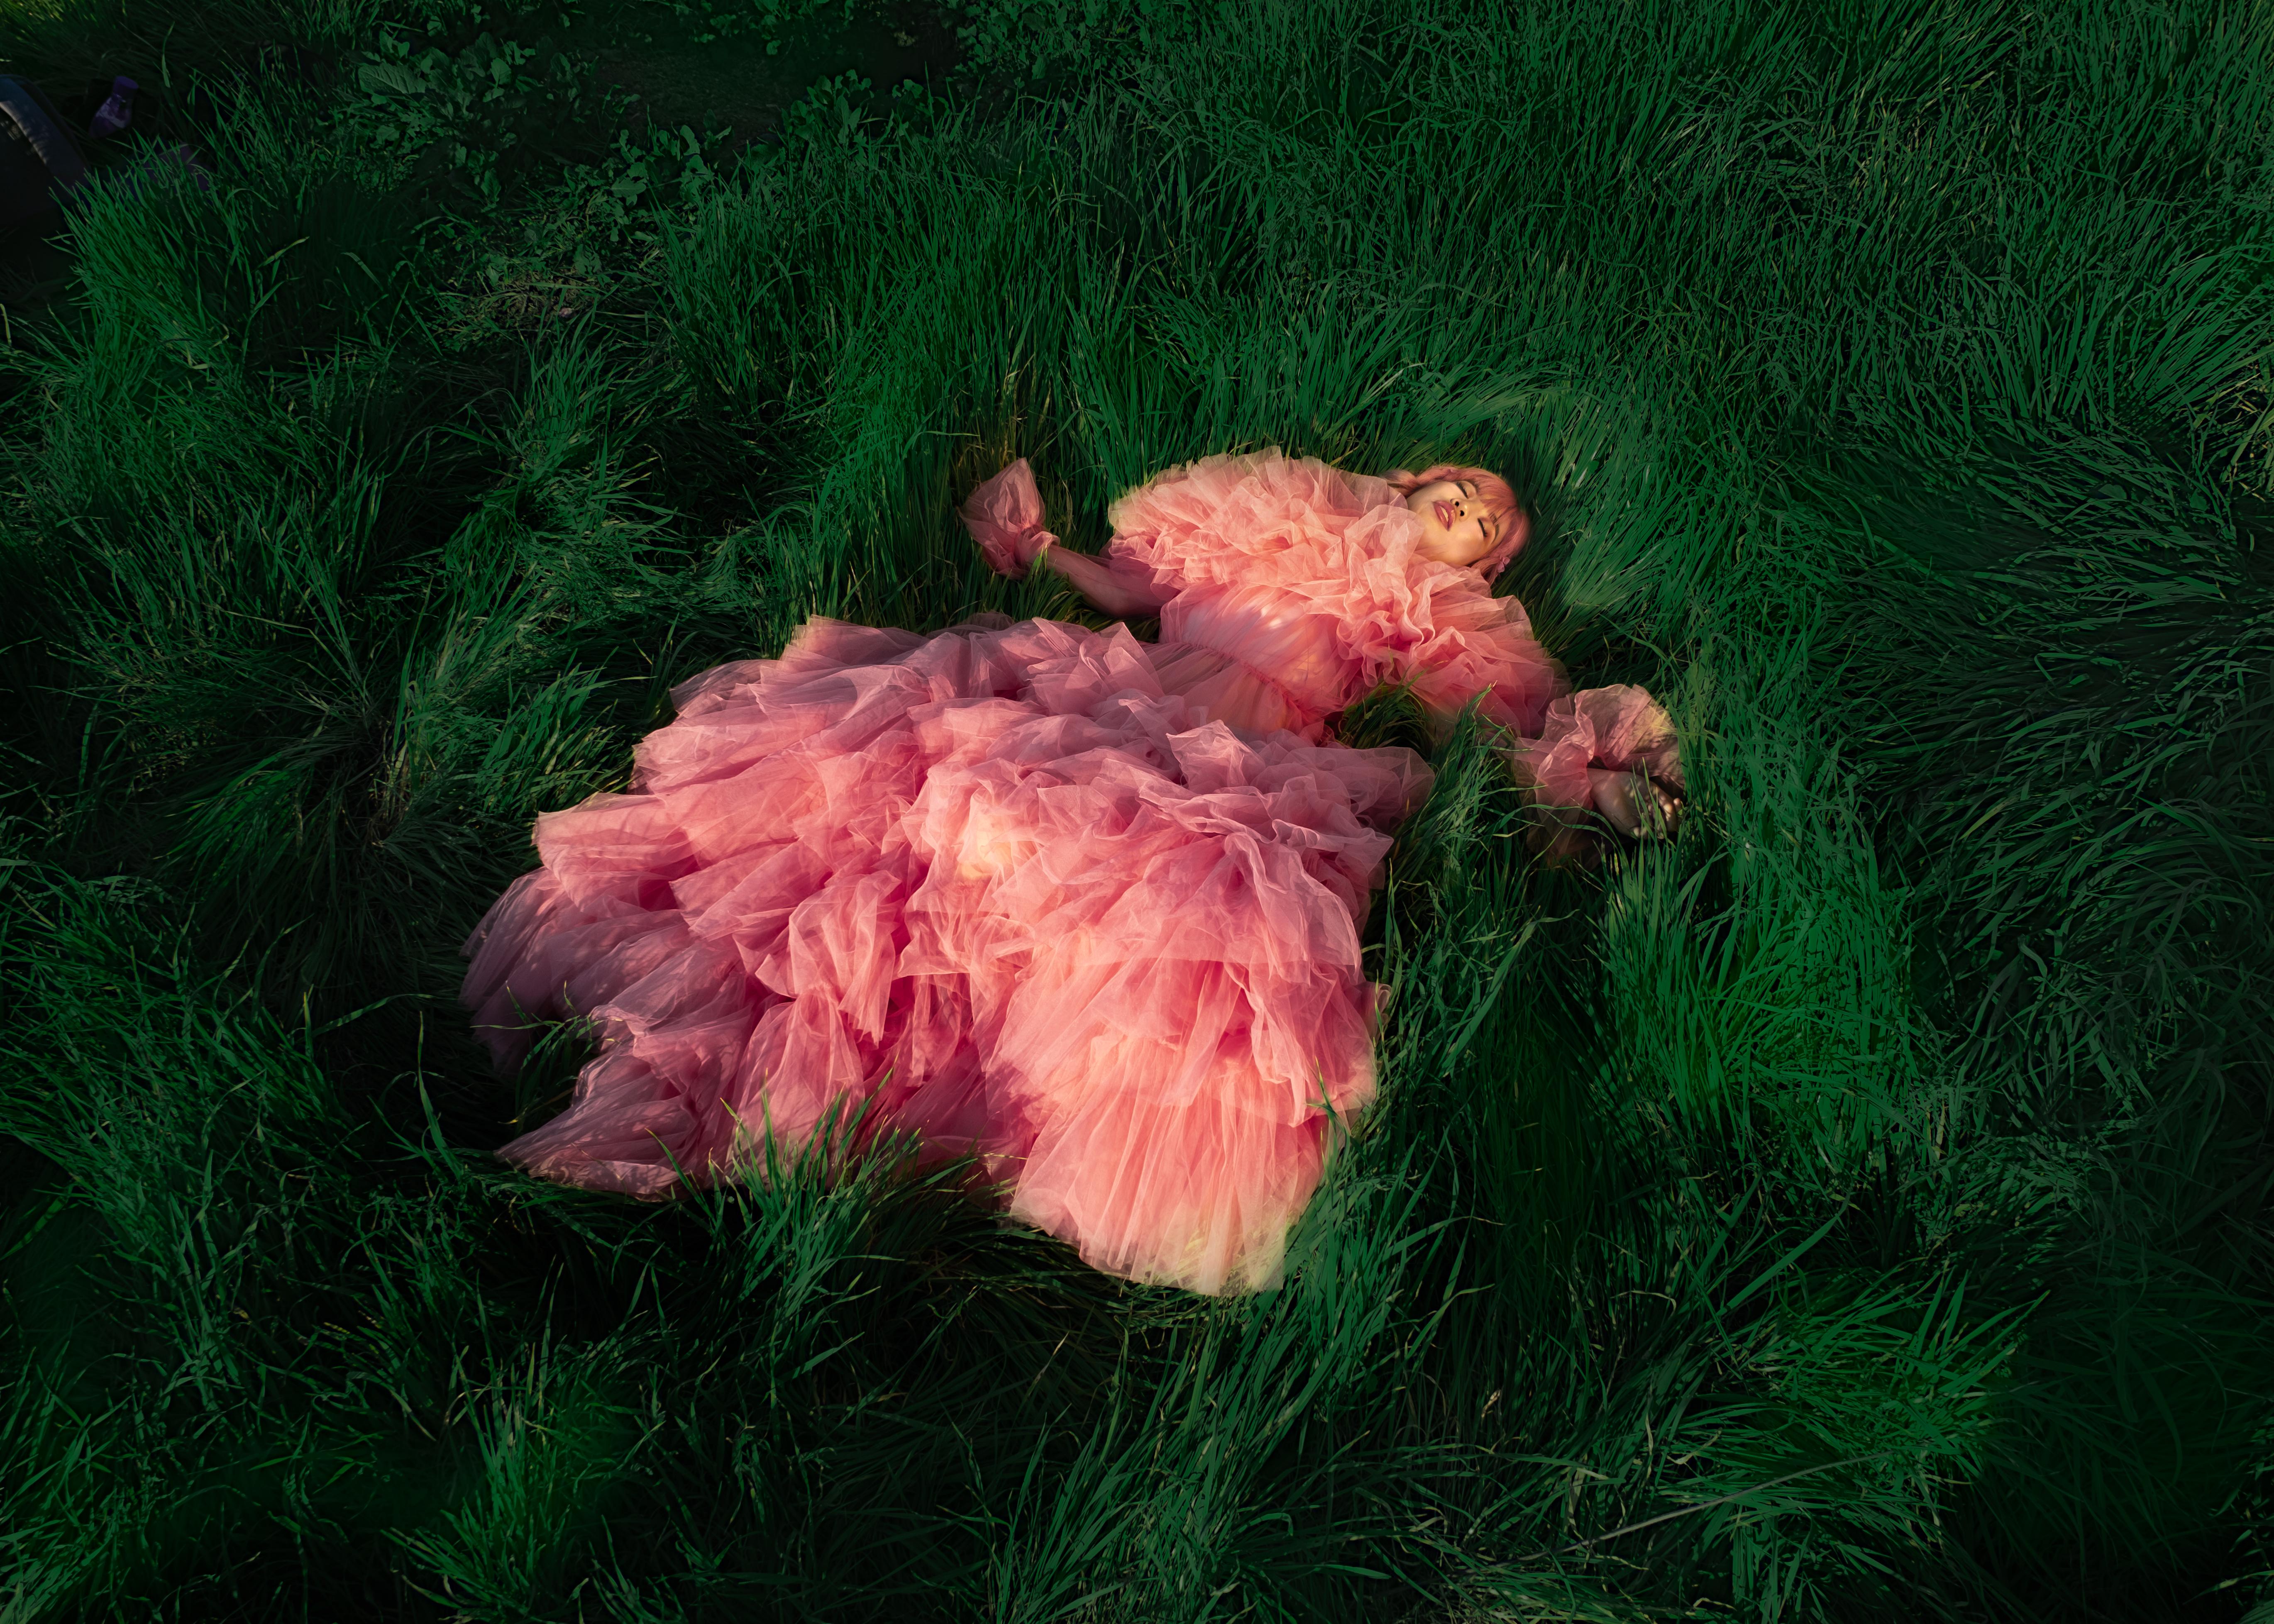 grassy dreams20200201-_DSF7646-2